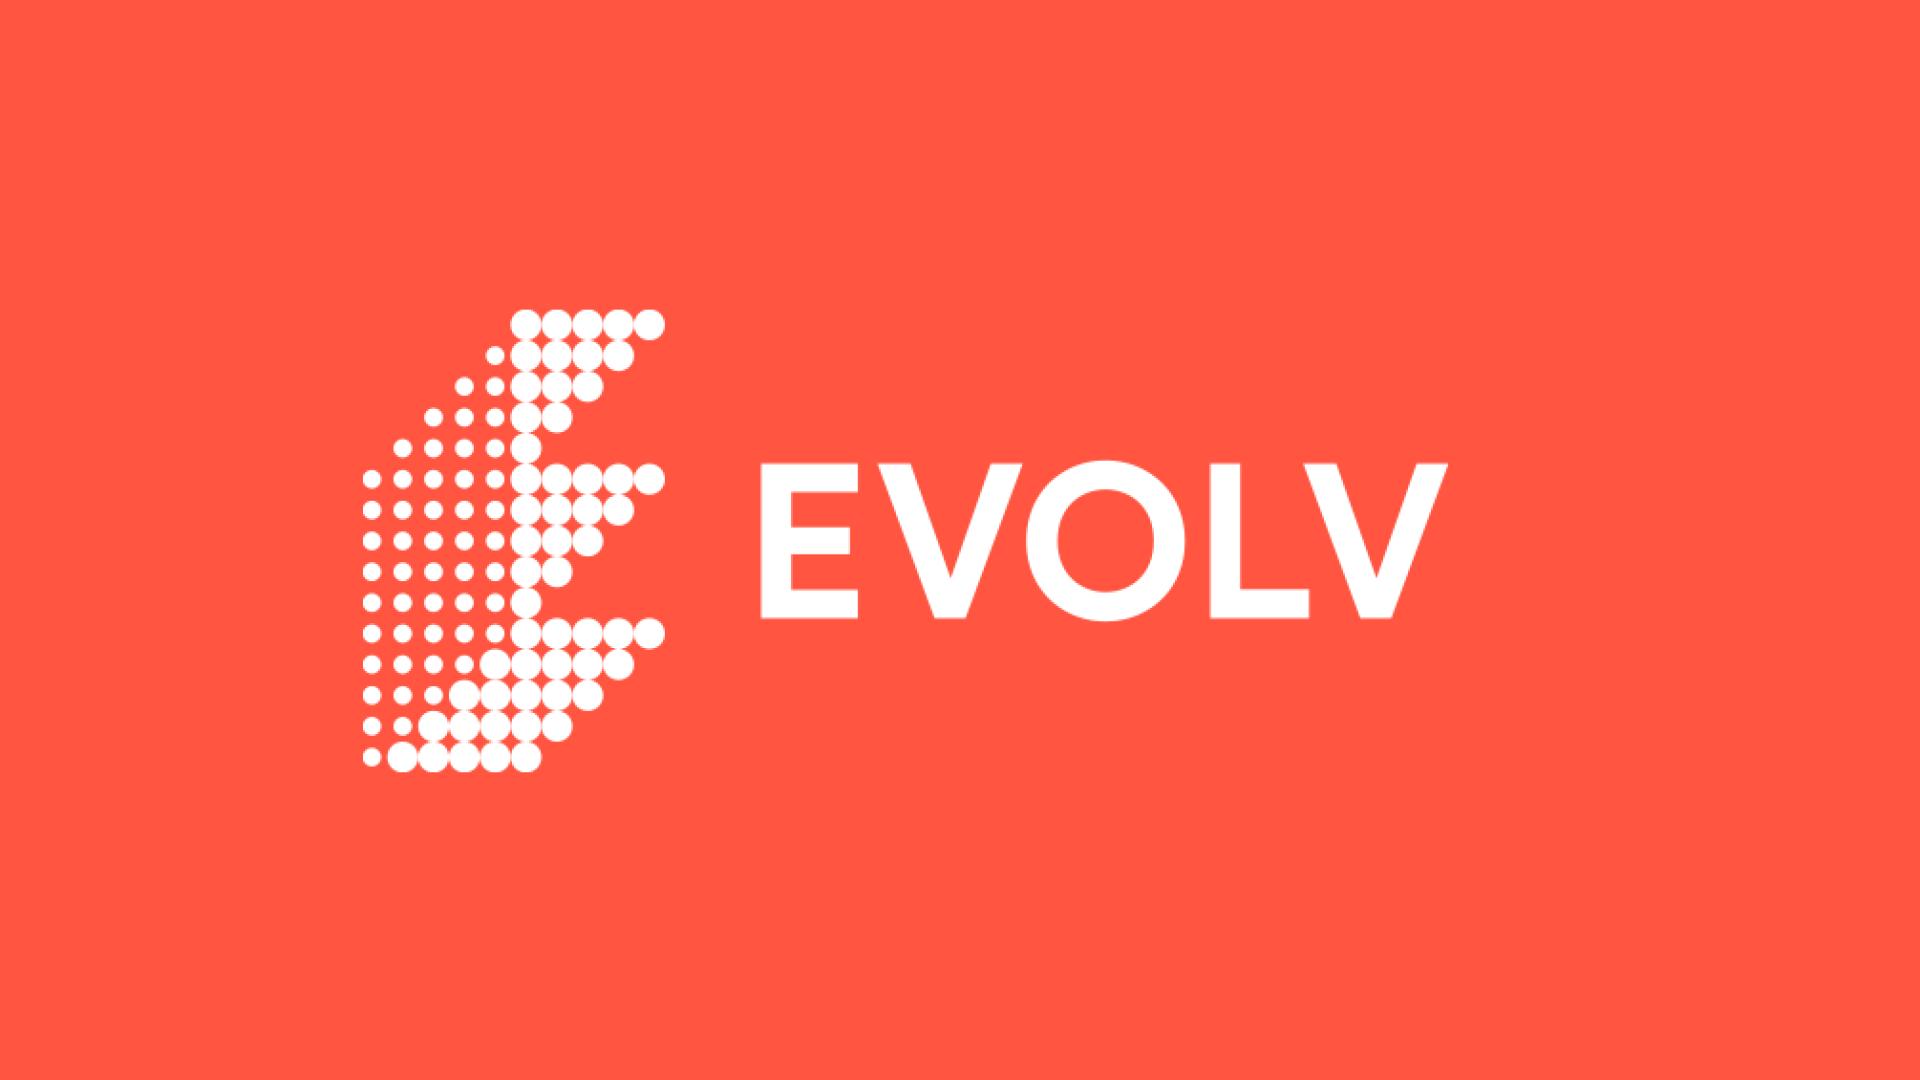 Evolv Technologies raises $10 million to automate web A/B testing with AI